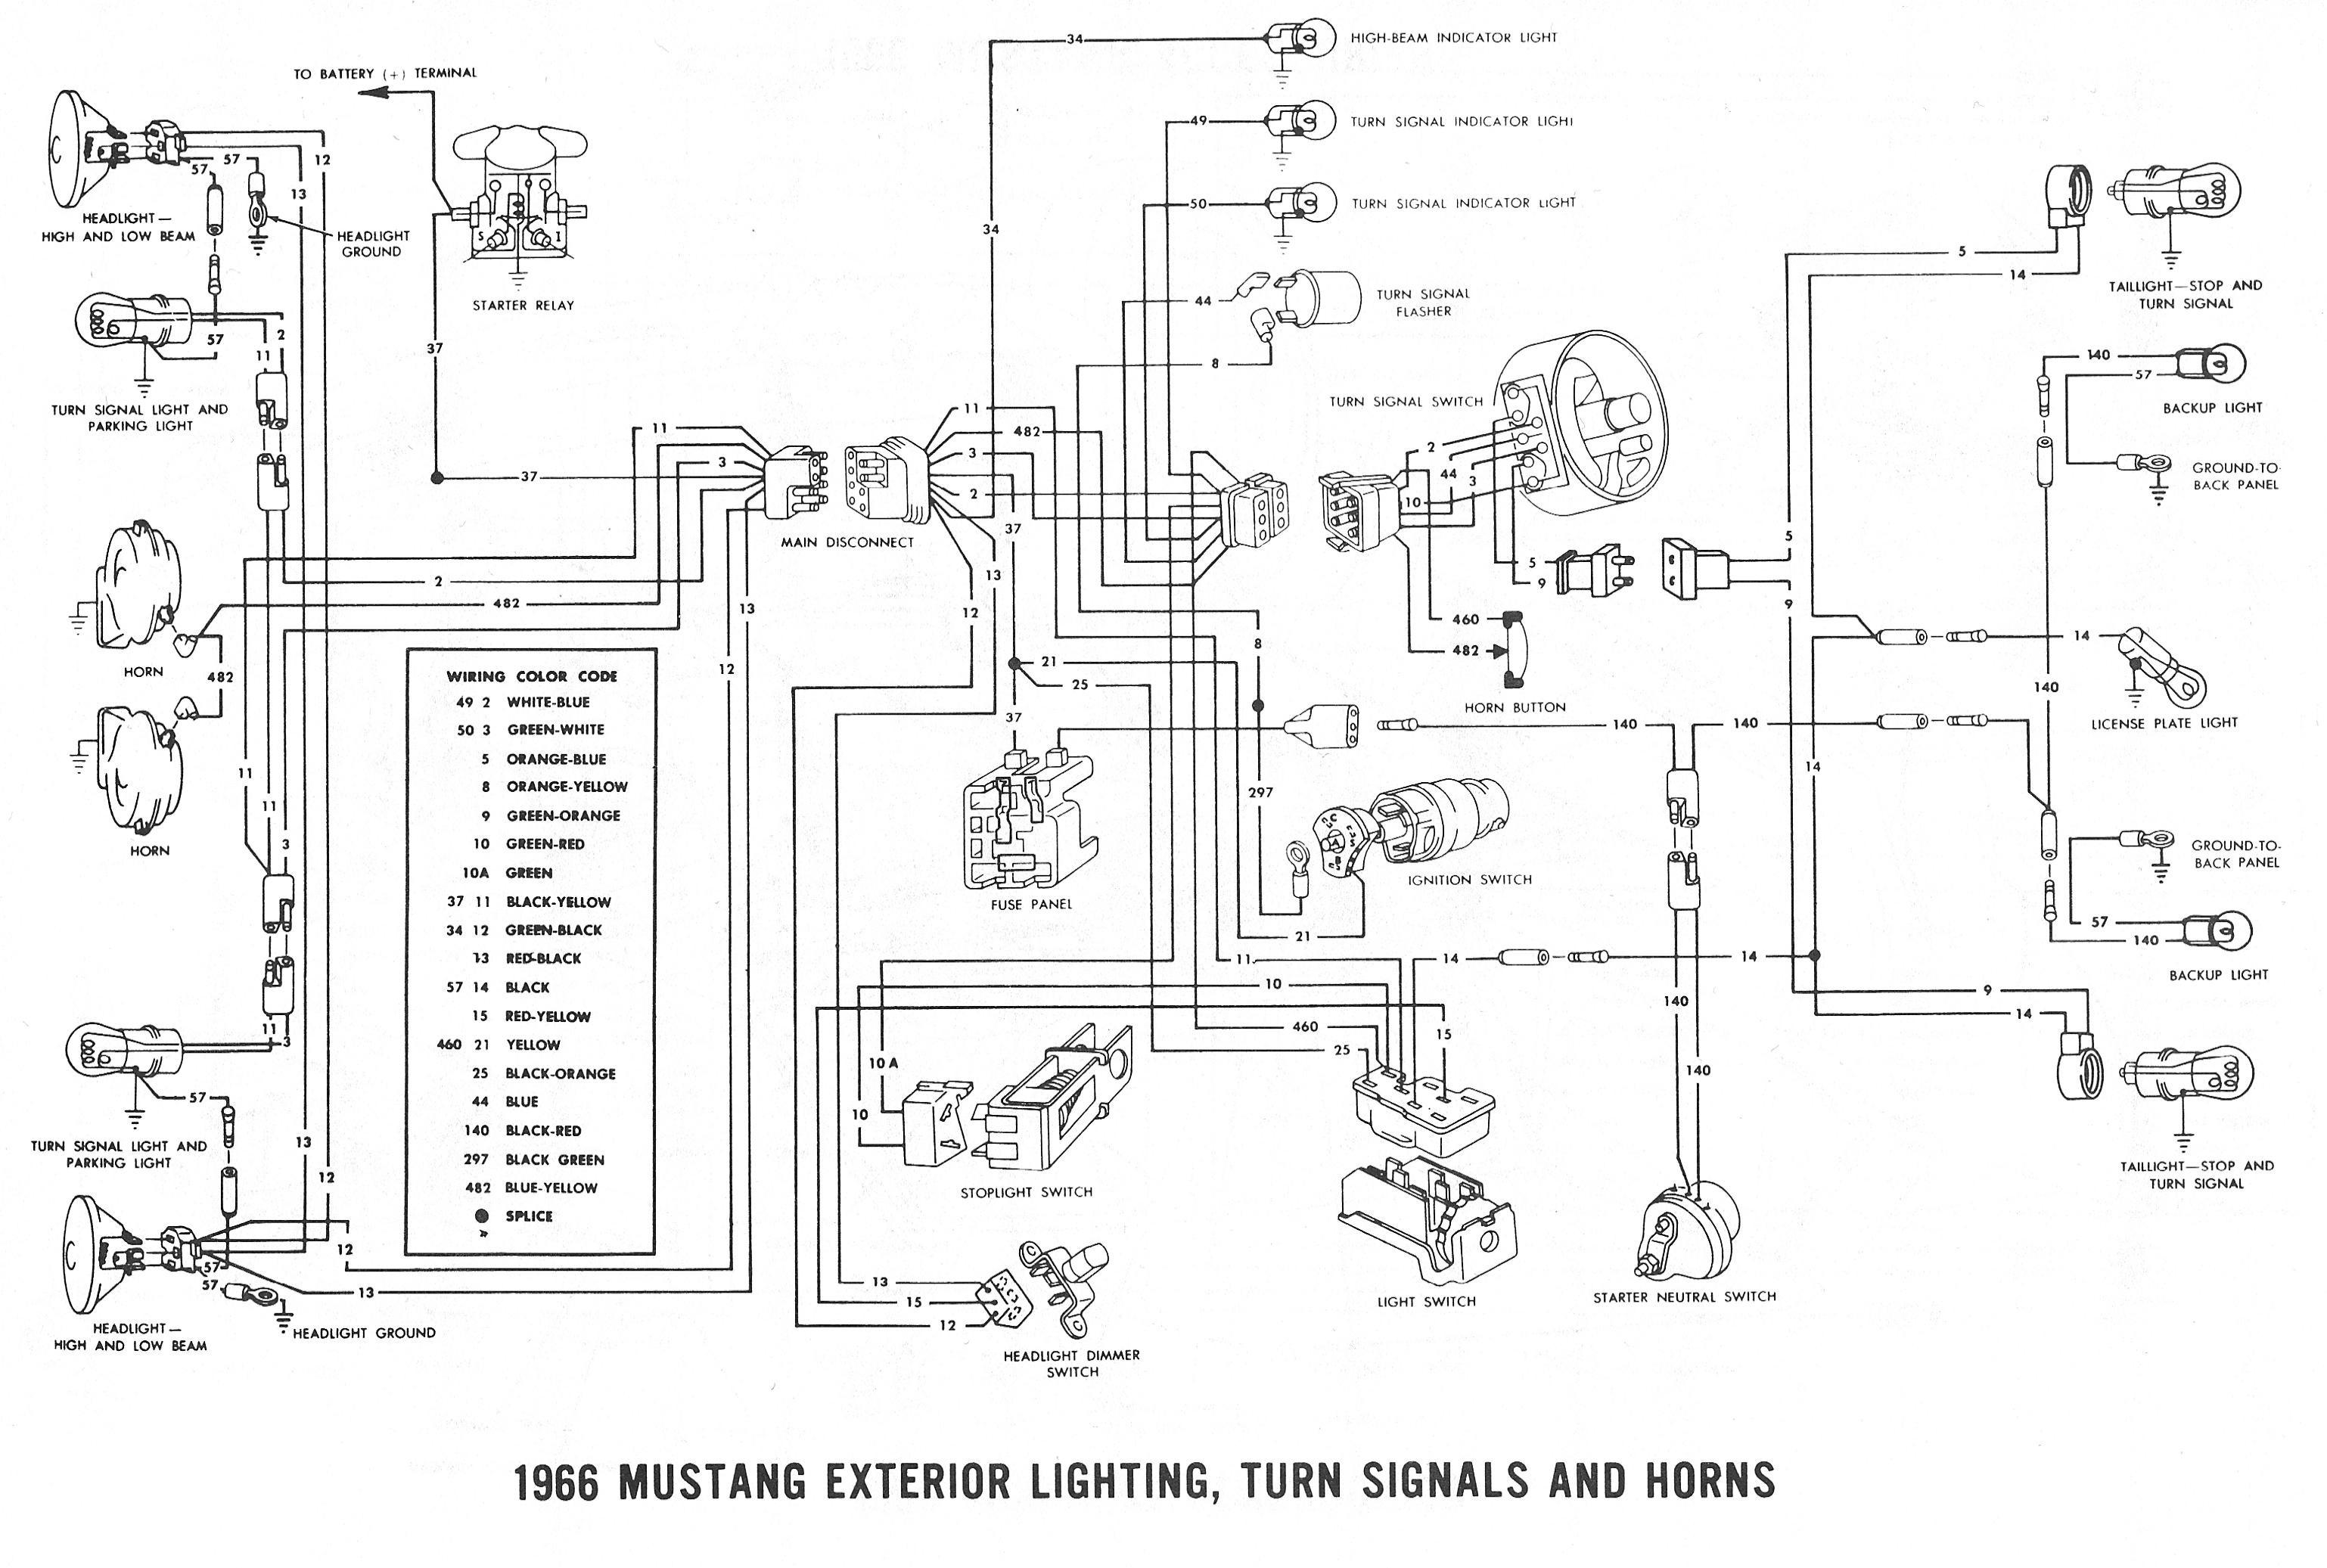 1965 Mustang Wiring Diagram Mustang Alternator Wiring Diagram Panel Im Find ford Truck Tearing Of 1965 Mustang Wiring Diagram